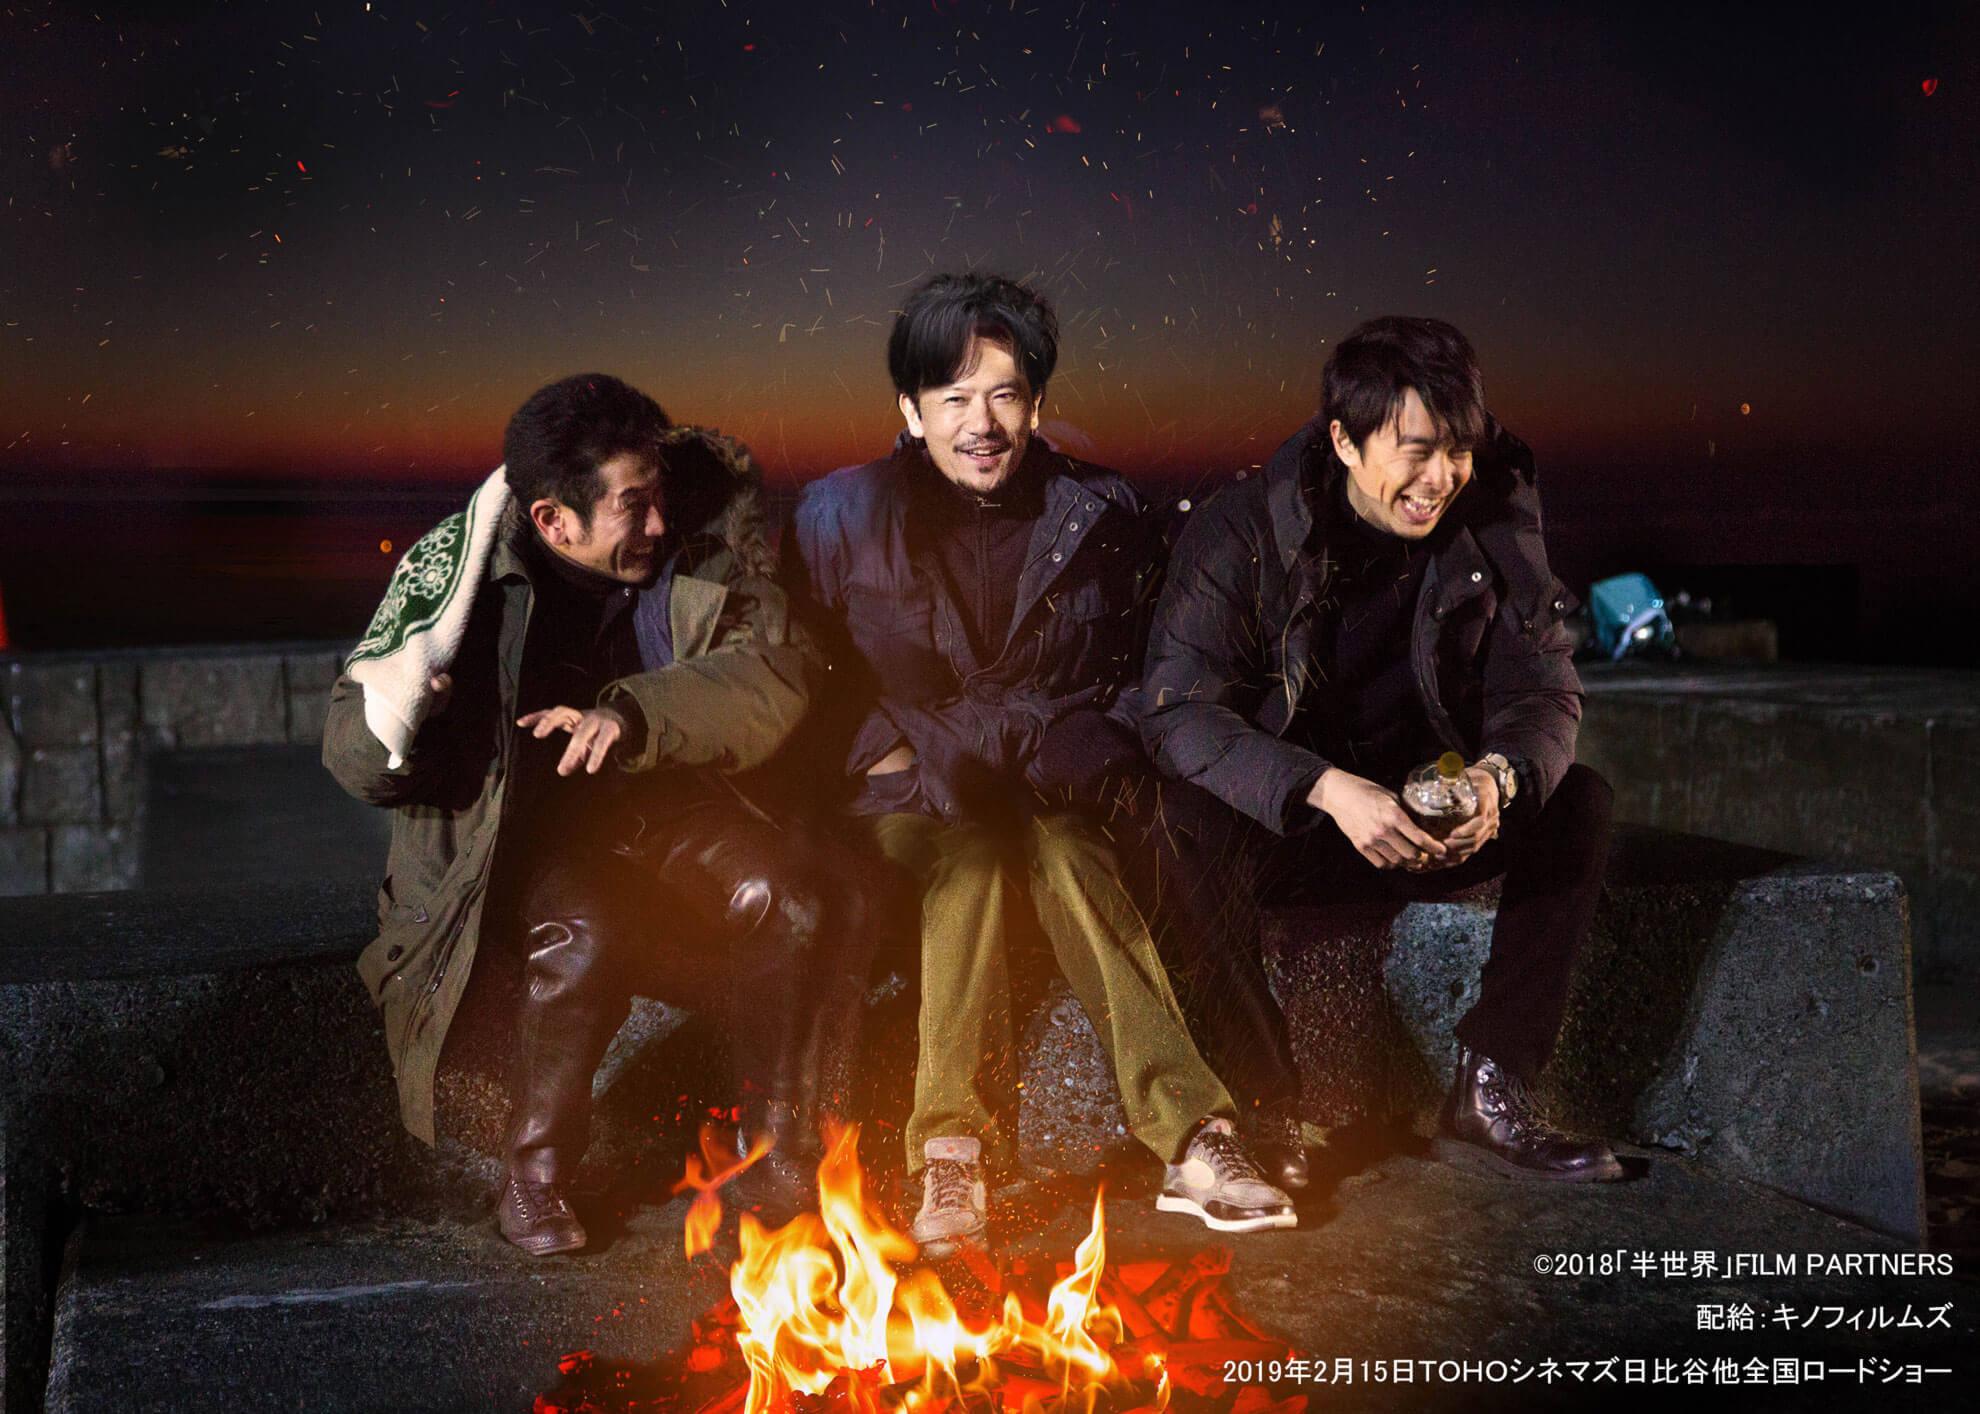 稲垣吾郎主演映画『半世界』阪本順治監督が語る主演の魅力